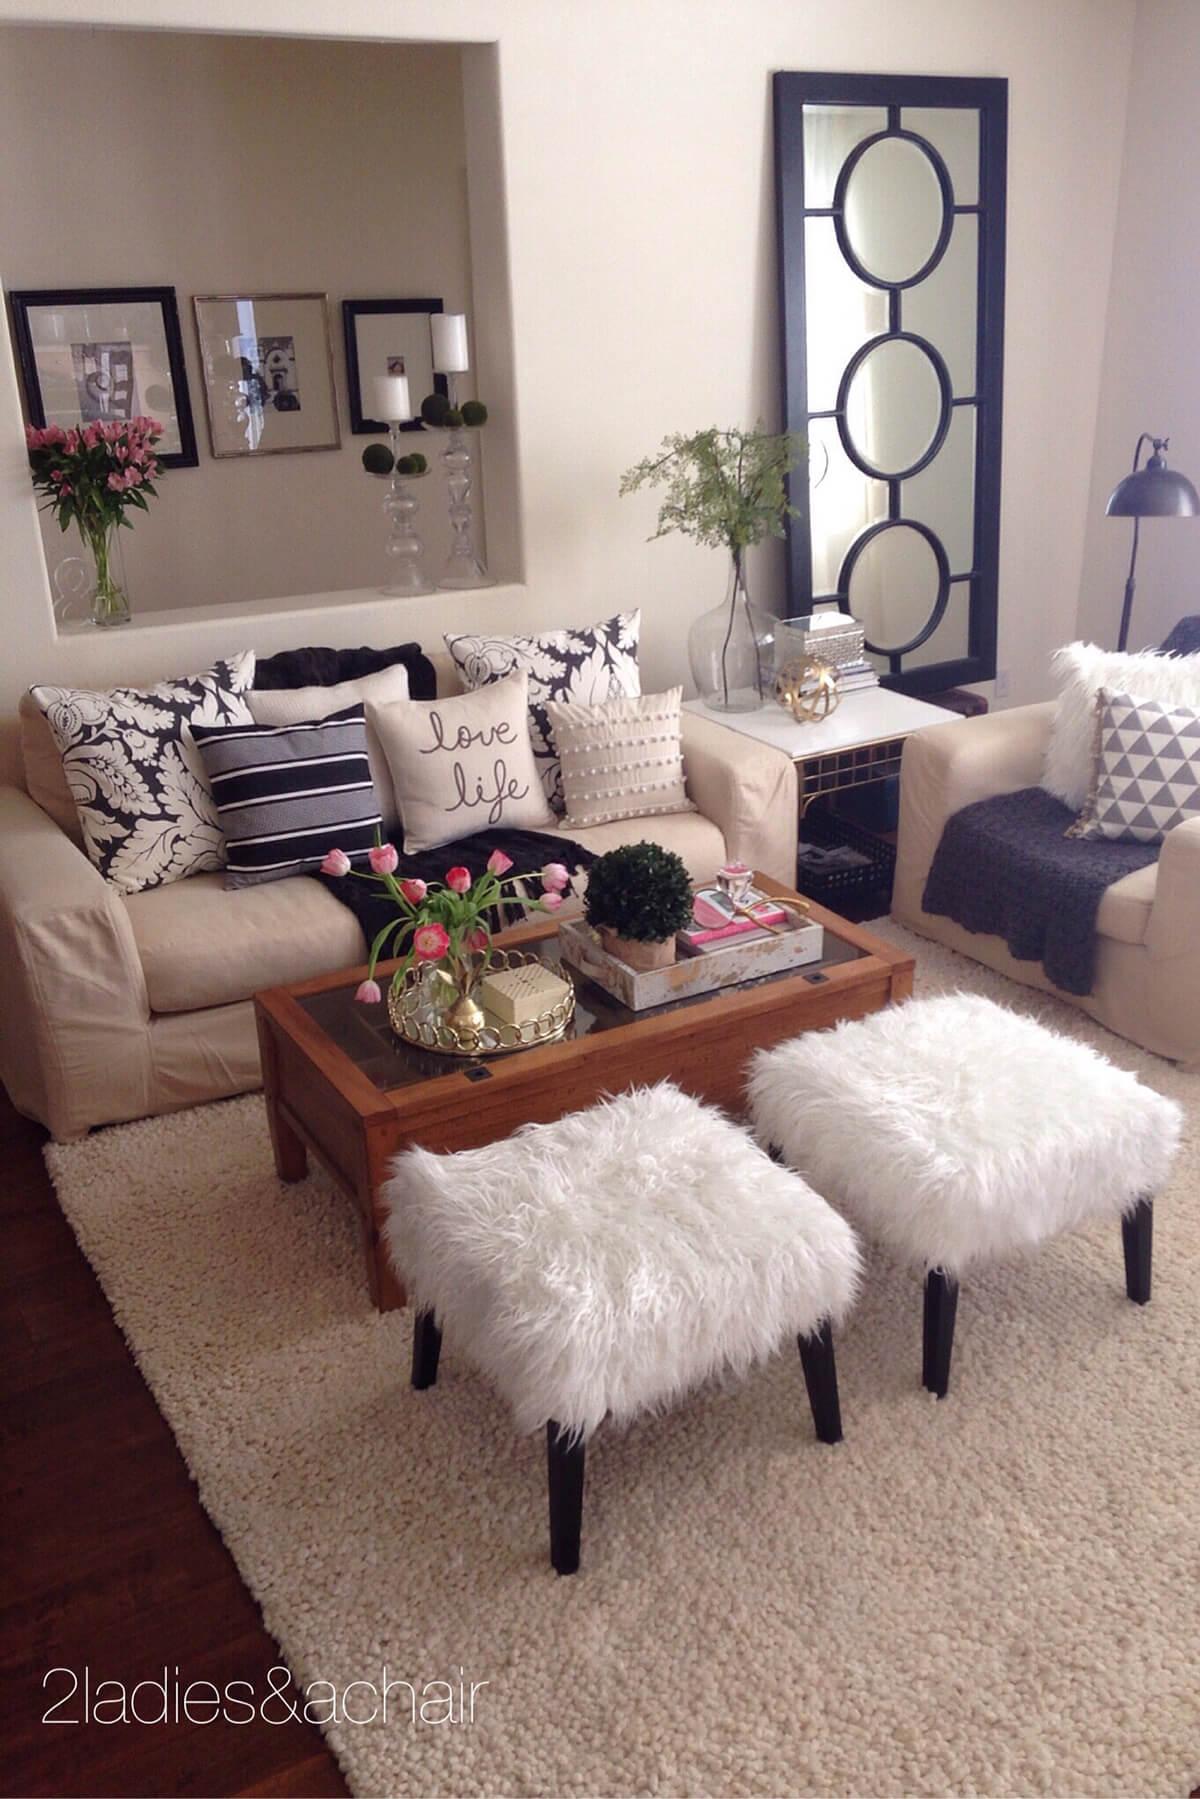 23 Best Beige Living Room Design Ideas for 2020 on Fun Living Room Ideas  id=81020